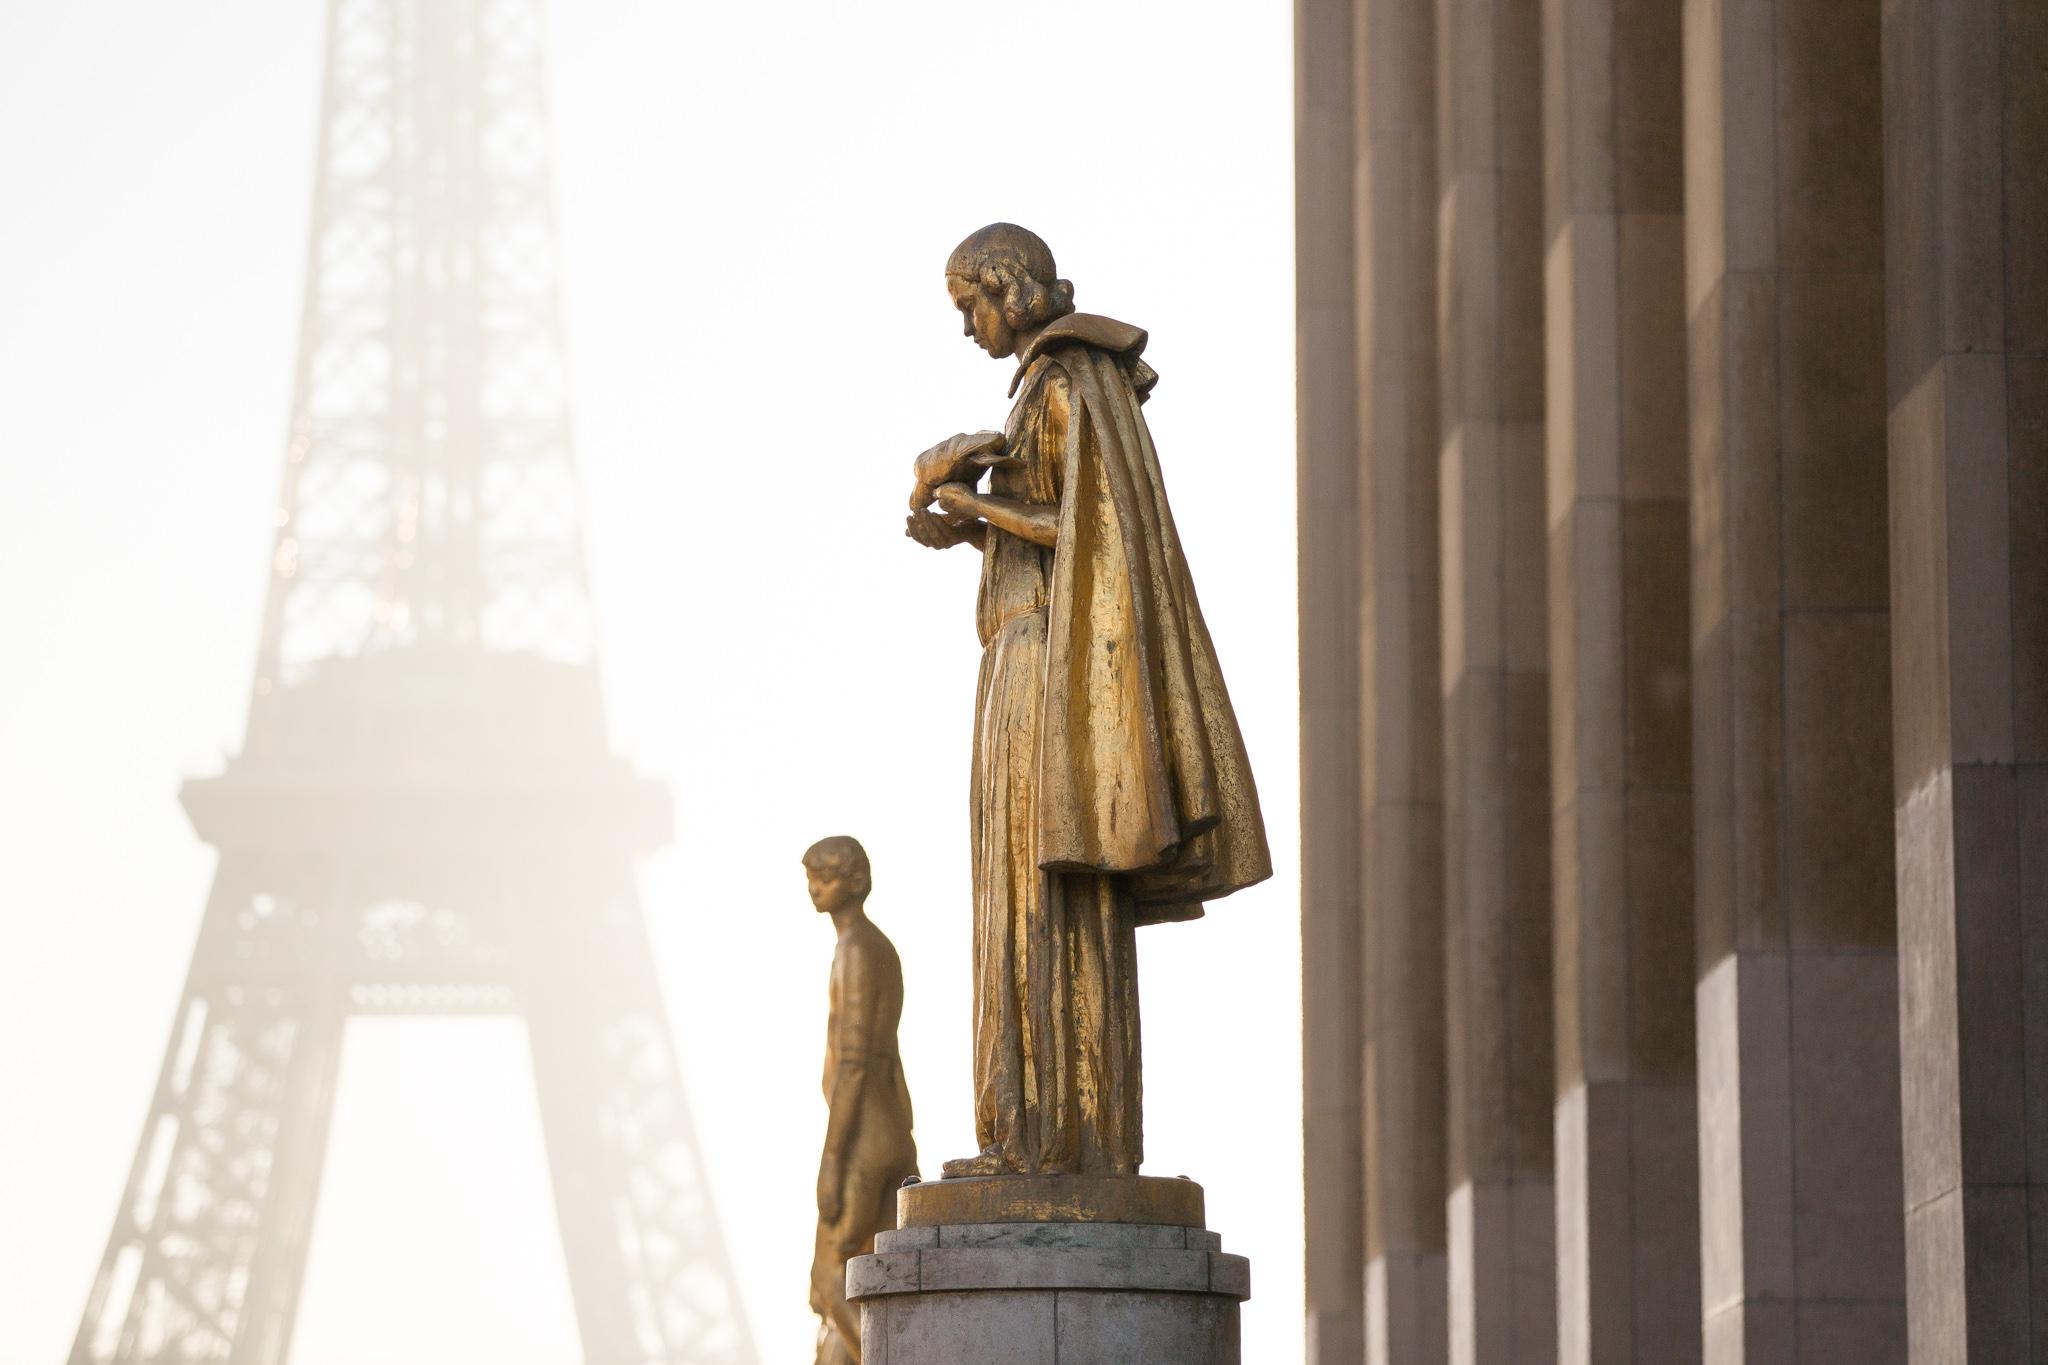 9653-famous-urban-photograph-in-paris.jpg